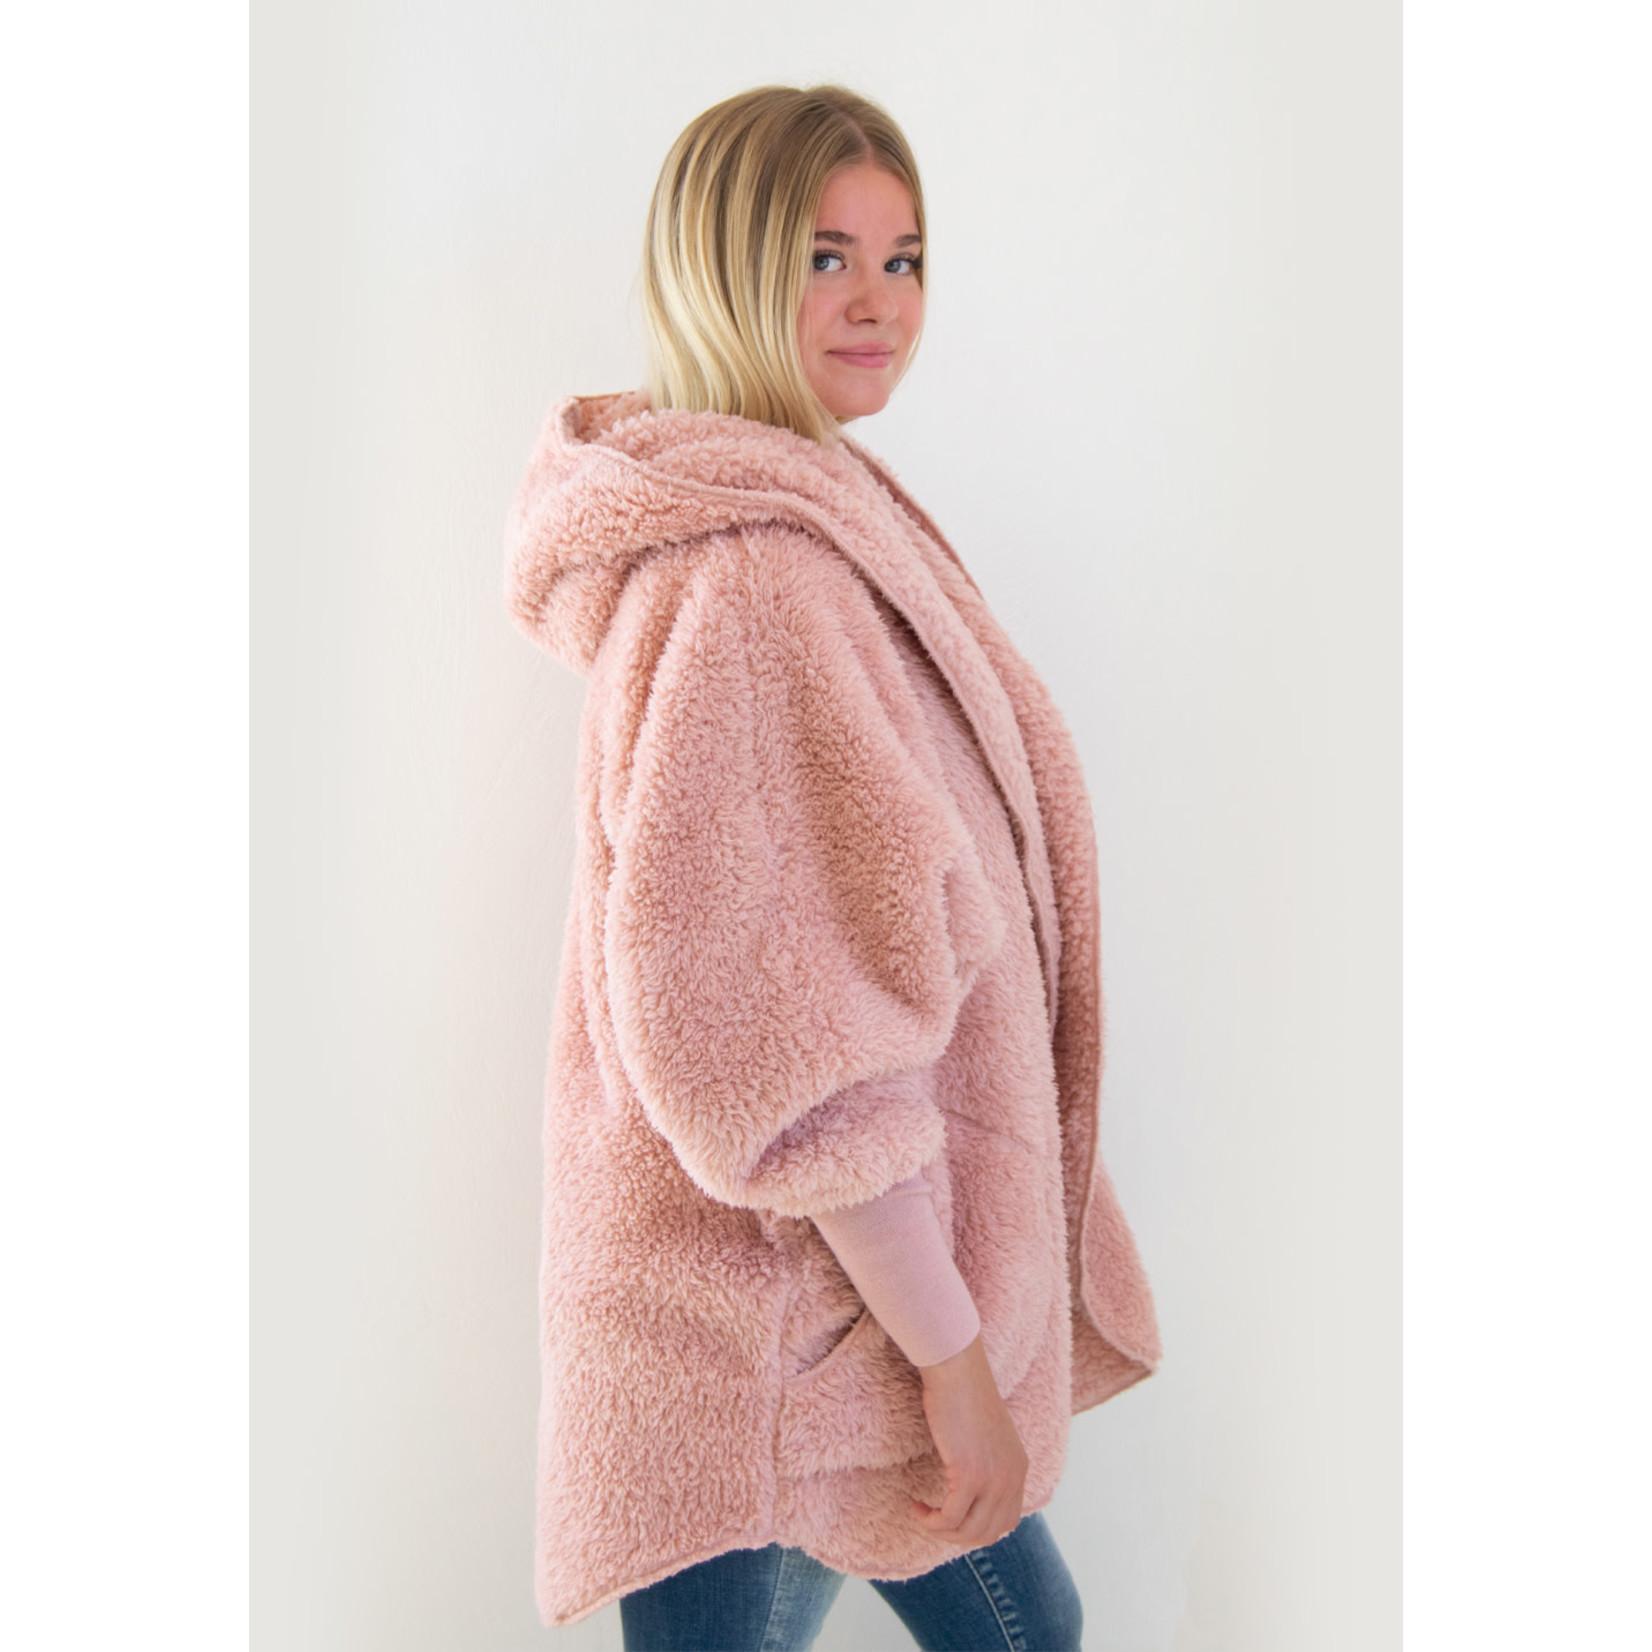 Nordic Beach Fuzzy Fleece Hooded Cardigan in Blush Wine